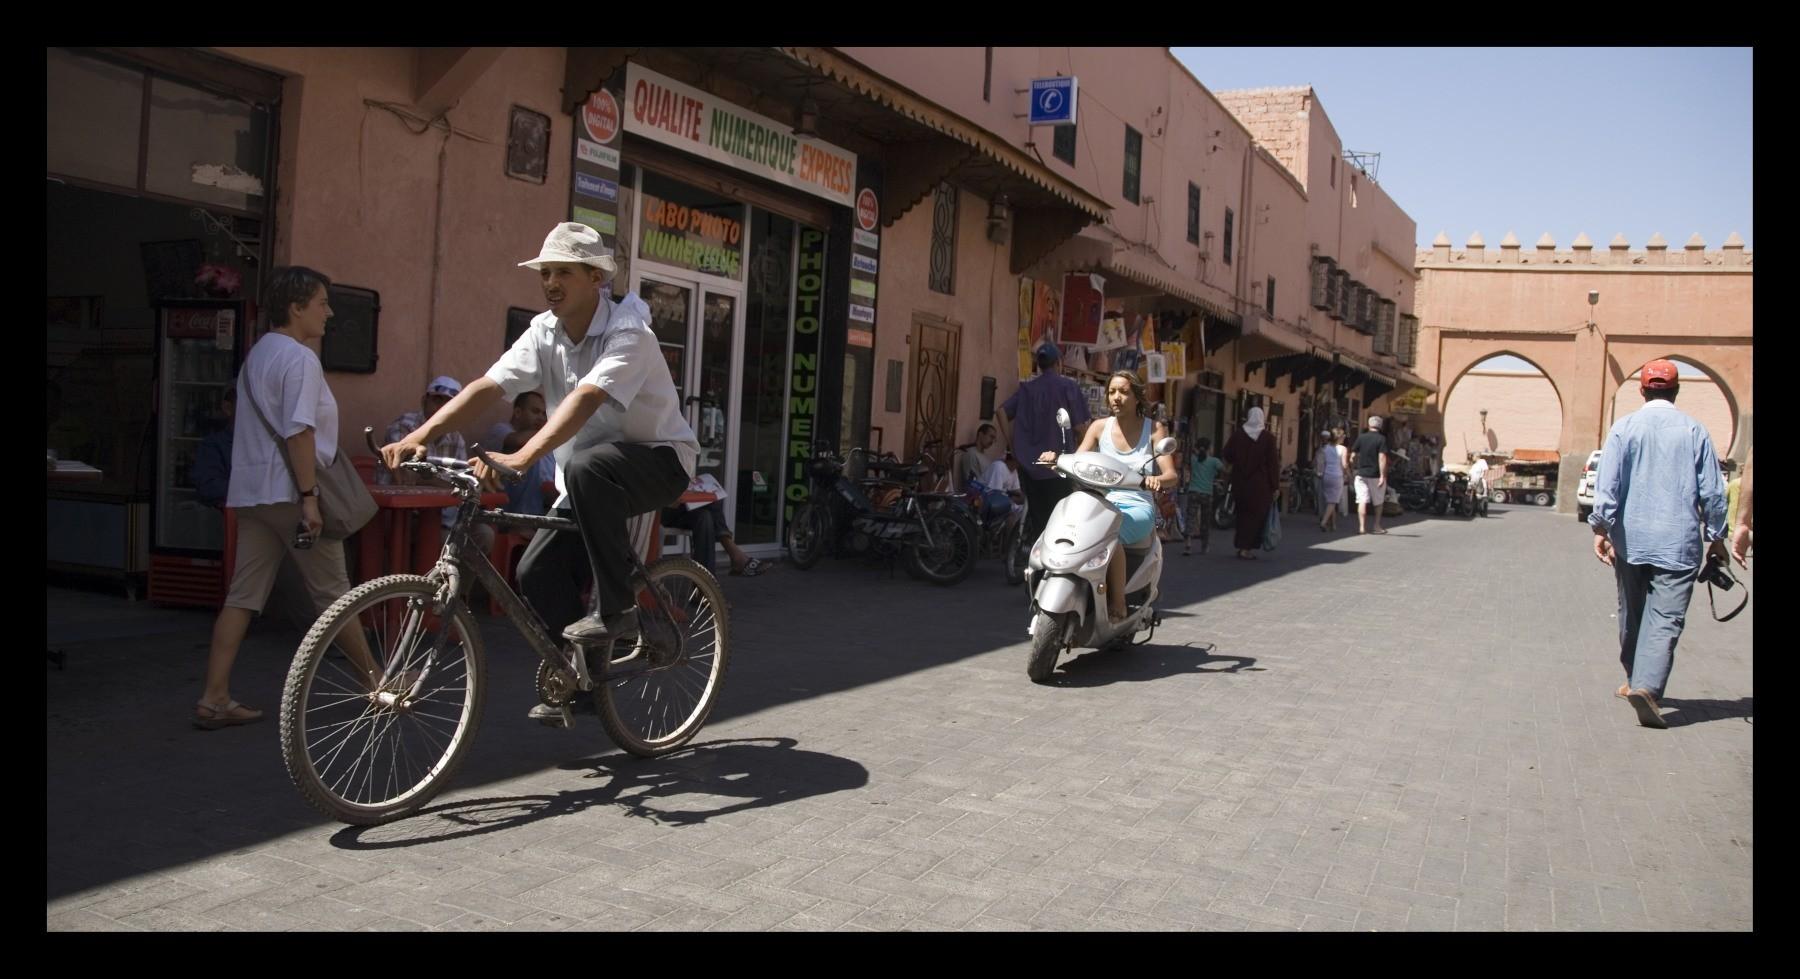 84714_DSC0127-bikers Storie di Luce